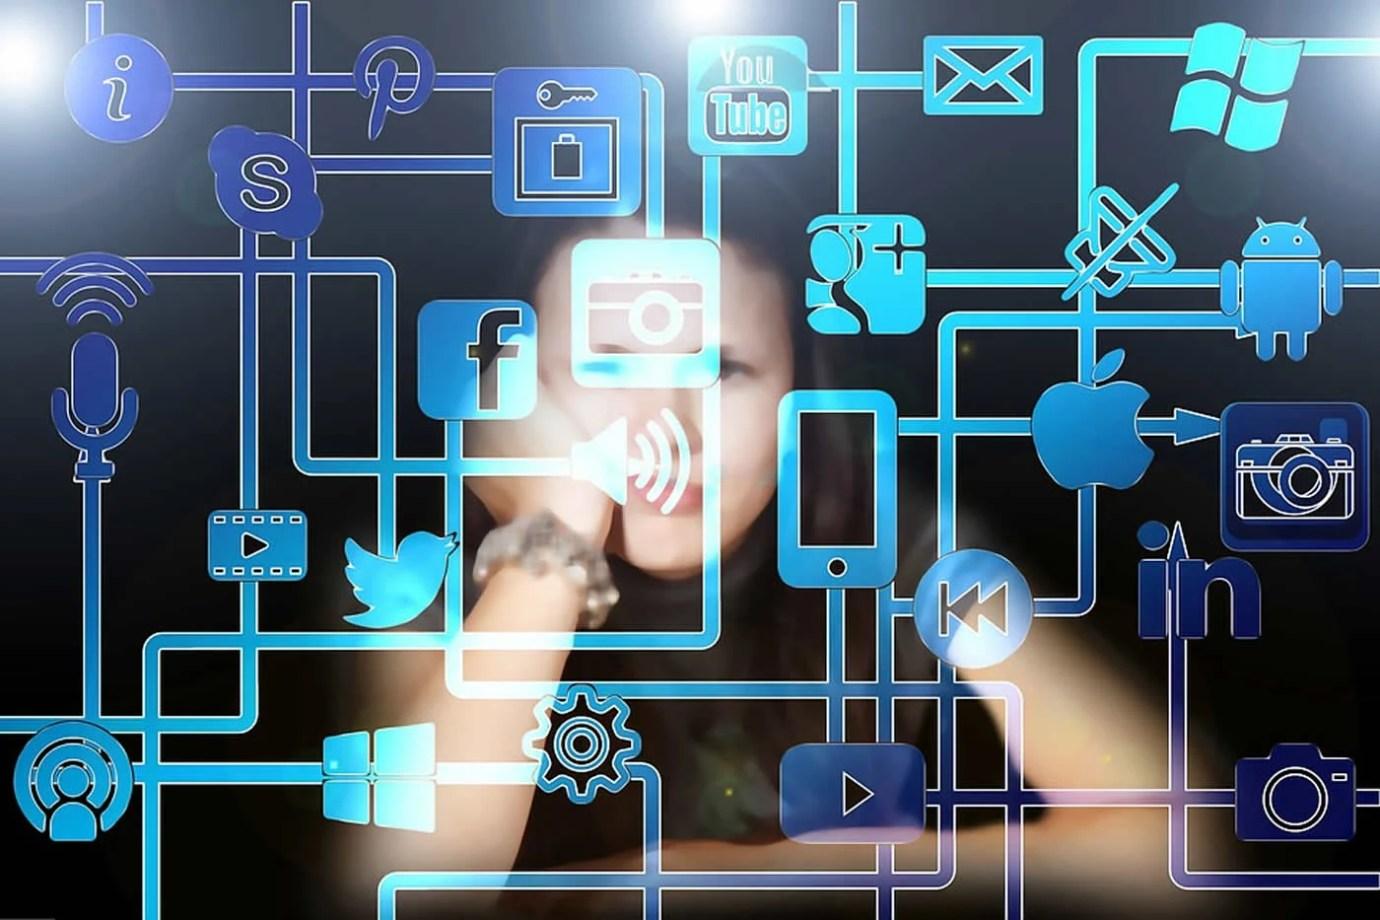 Image shows a woman and social media symbols.